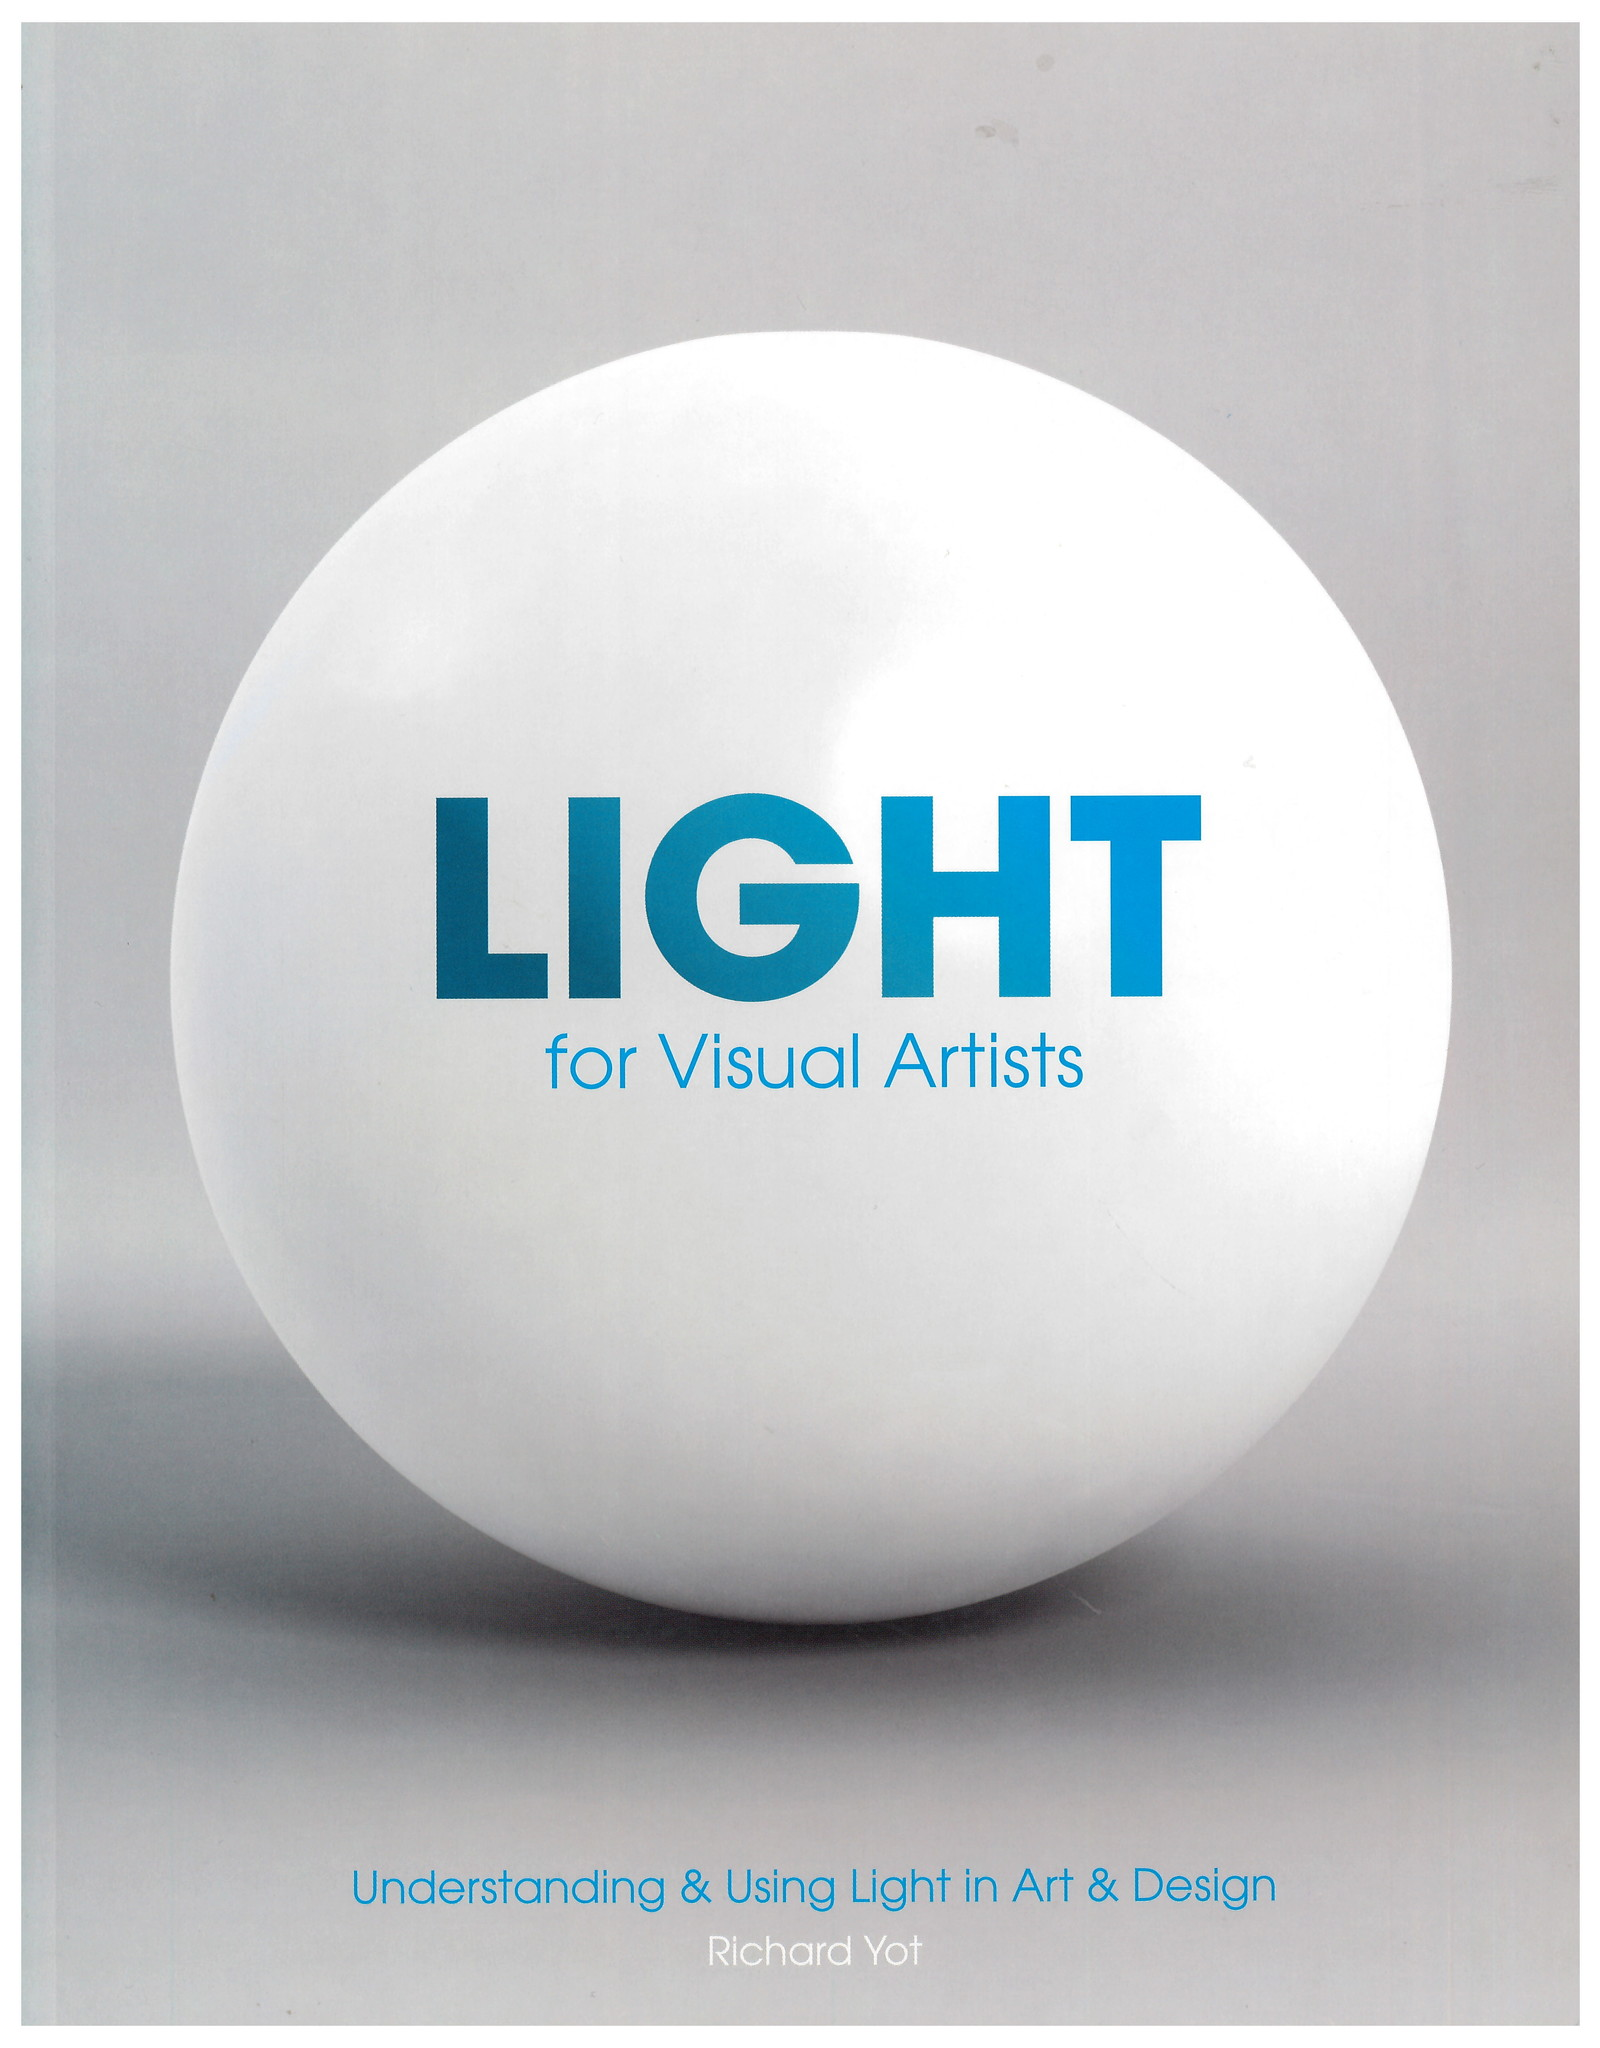 Light for Visual Artists / Richard Yot